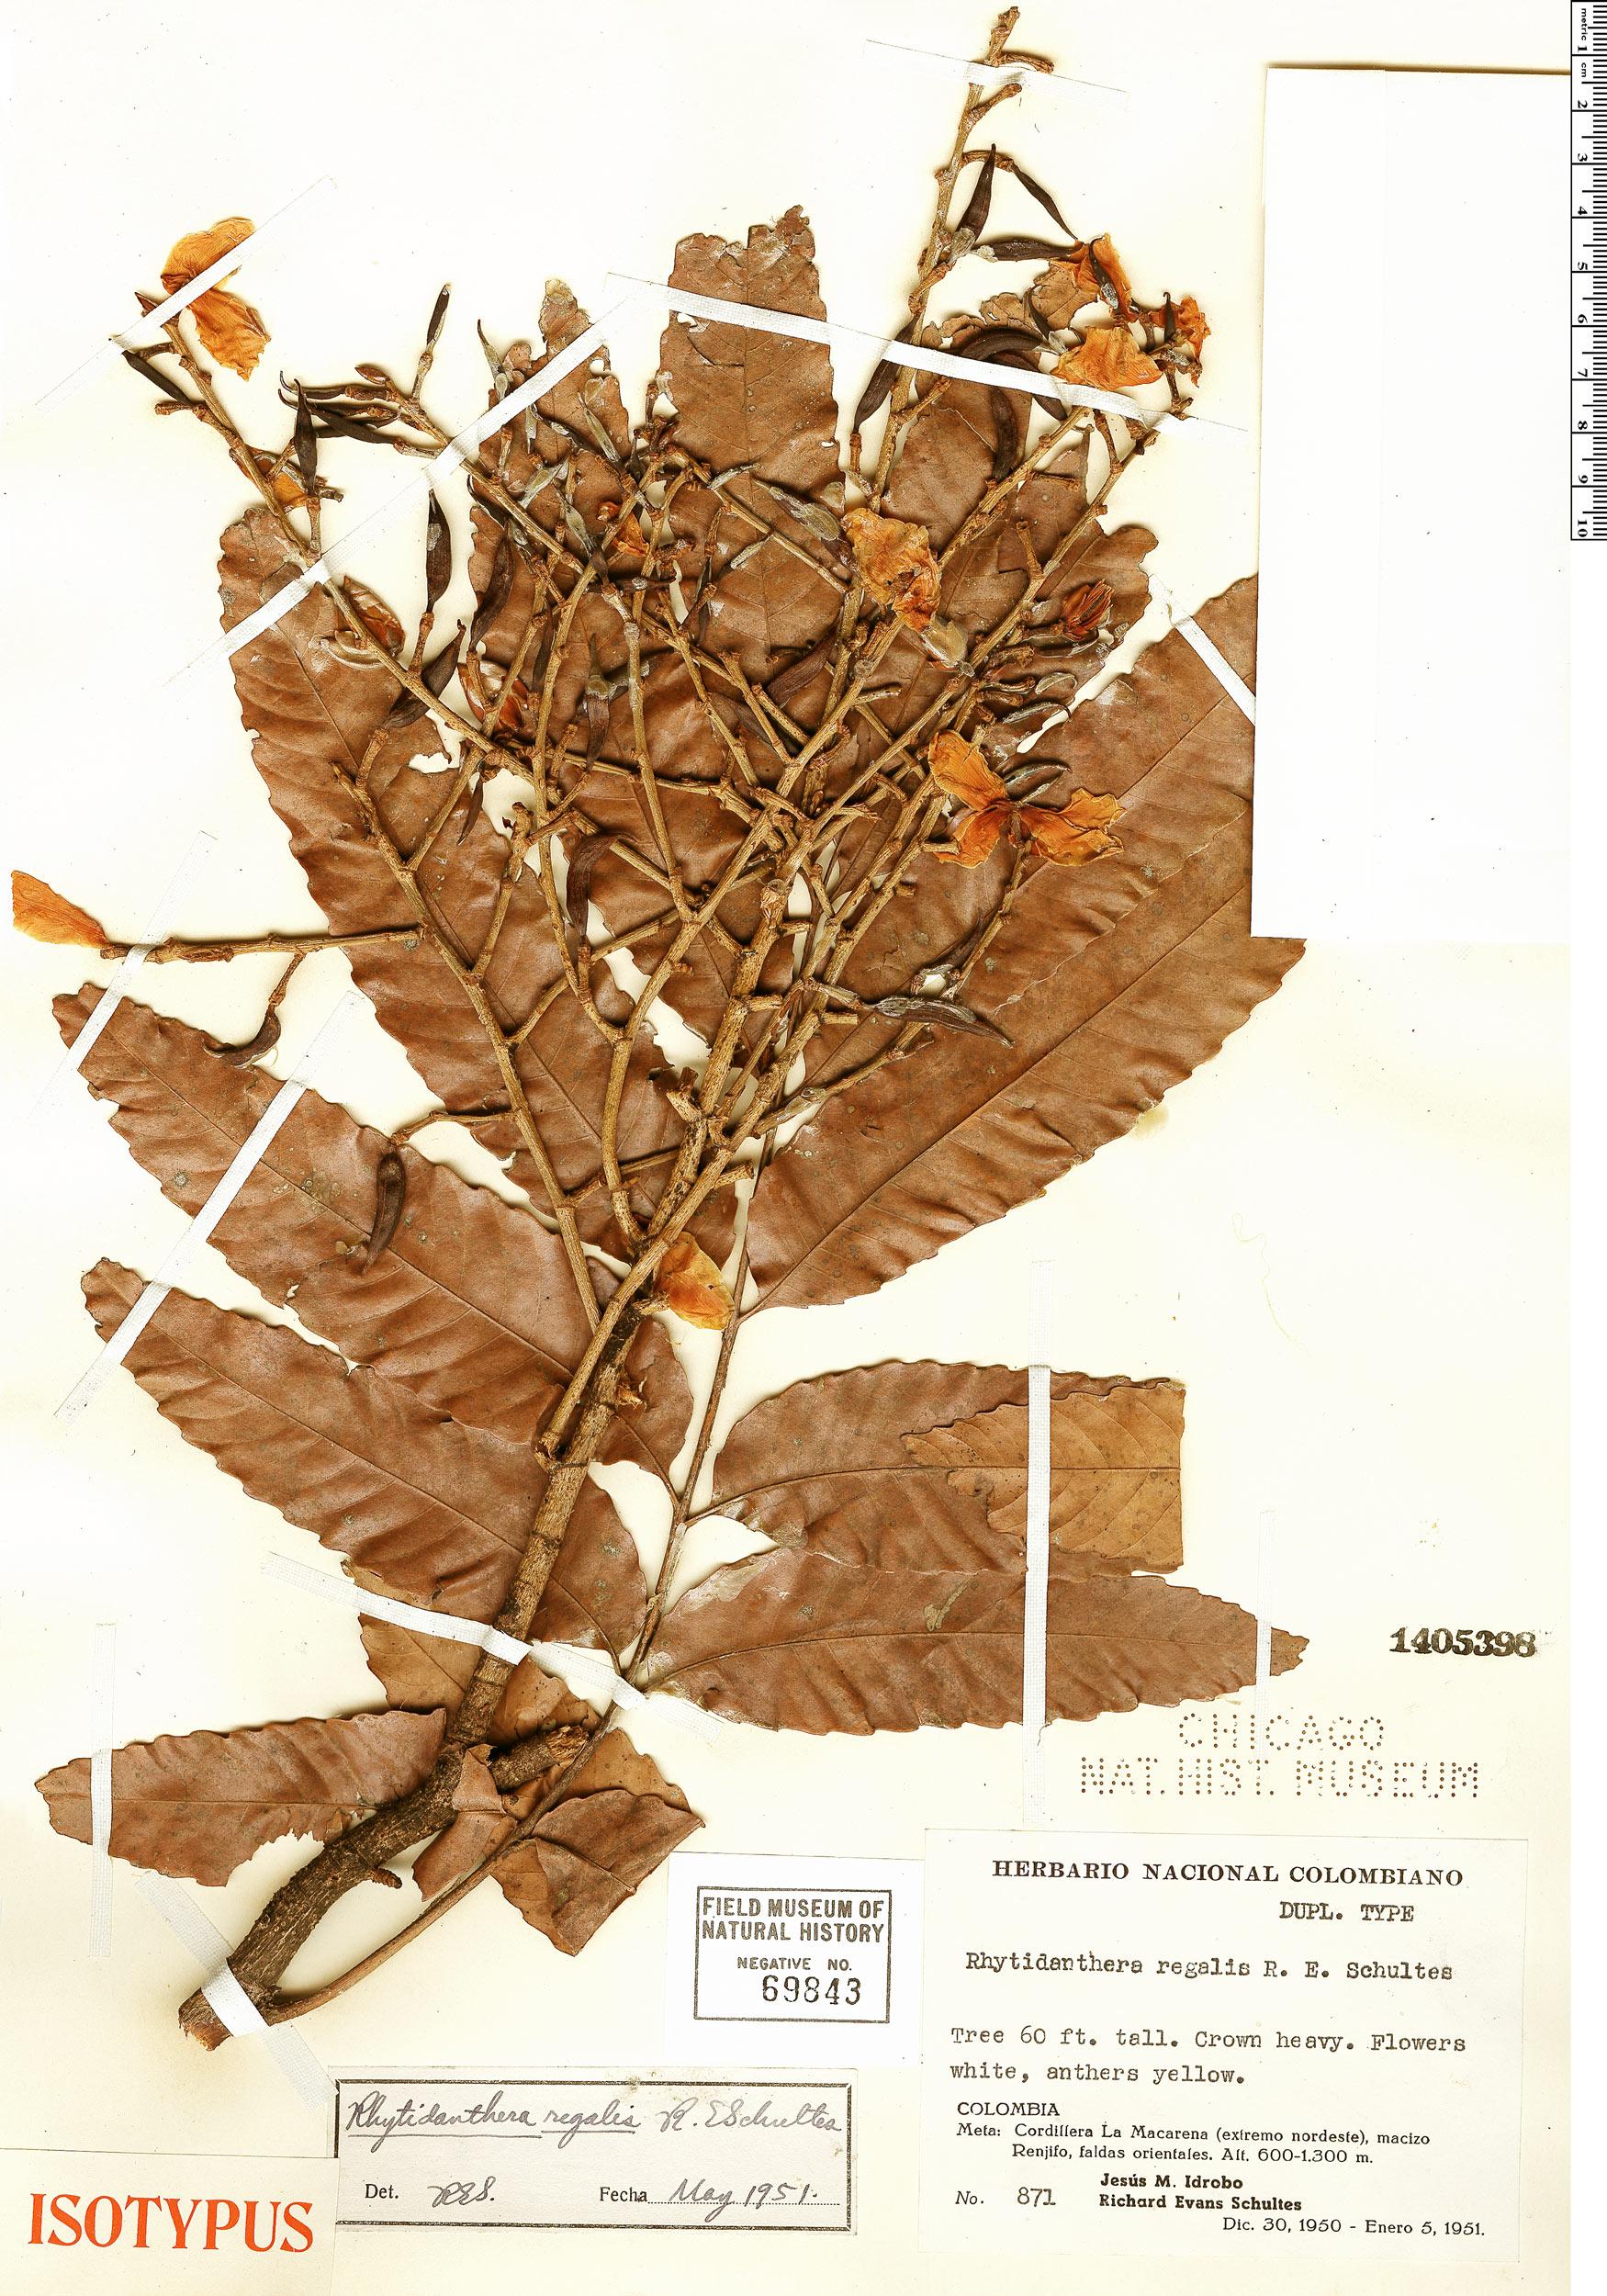 Specimen: Rhytidanthera regalis